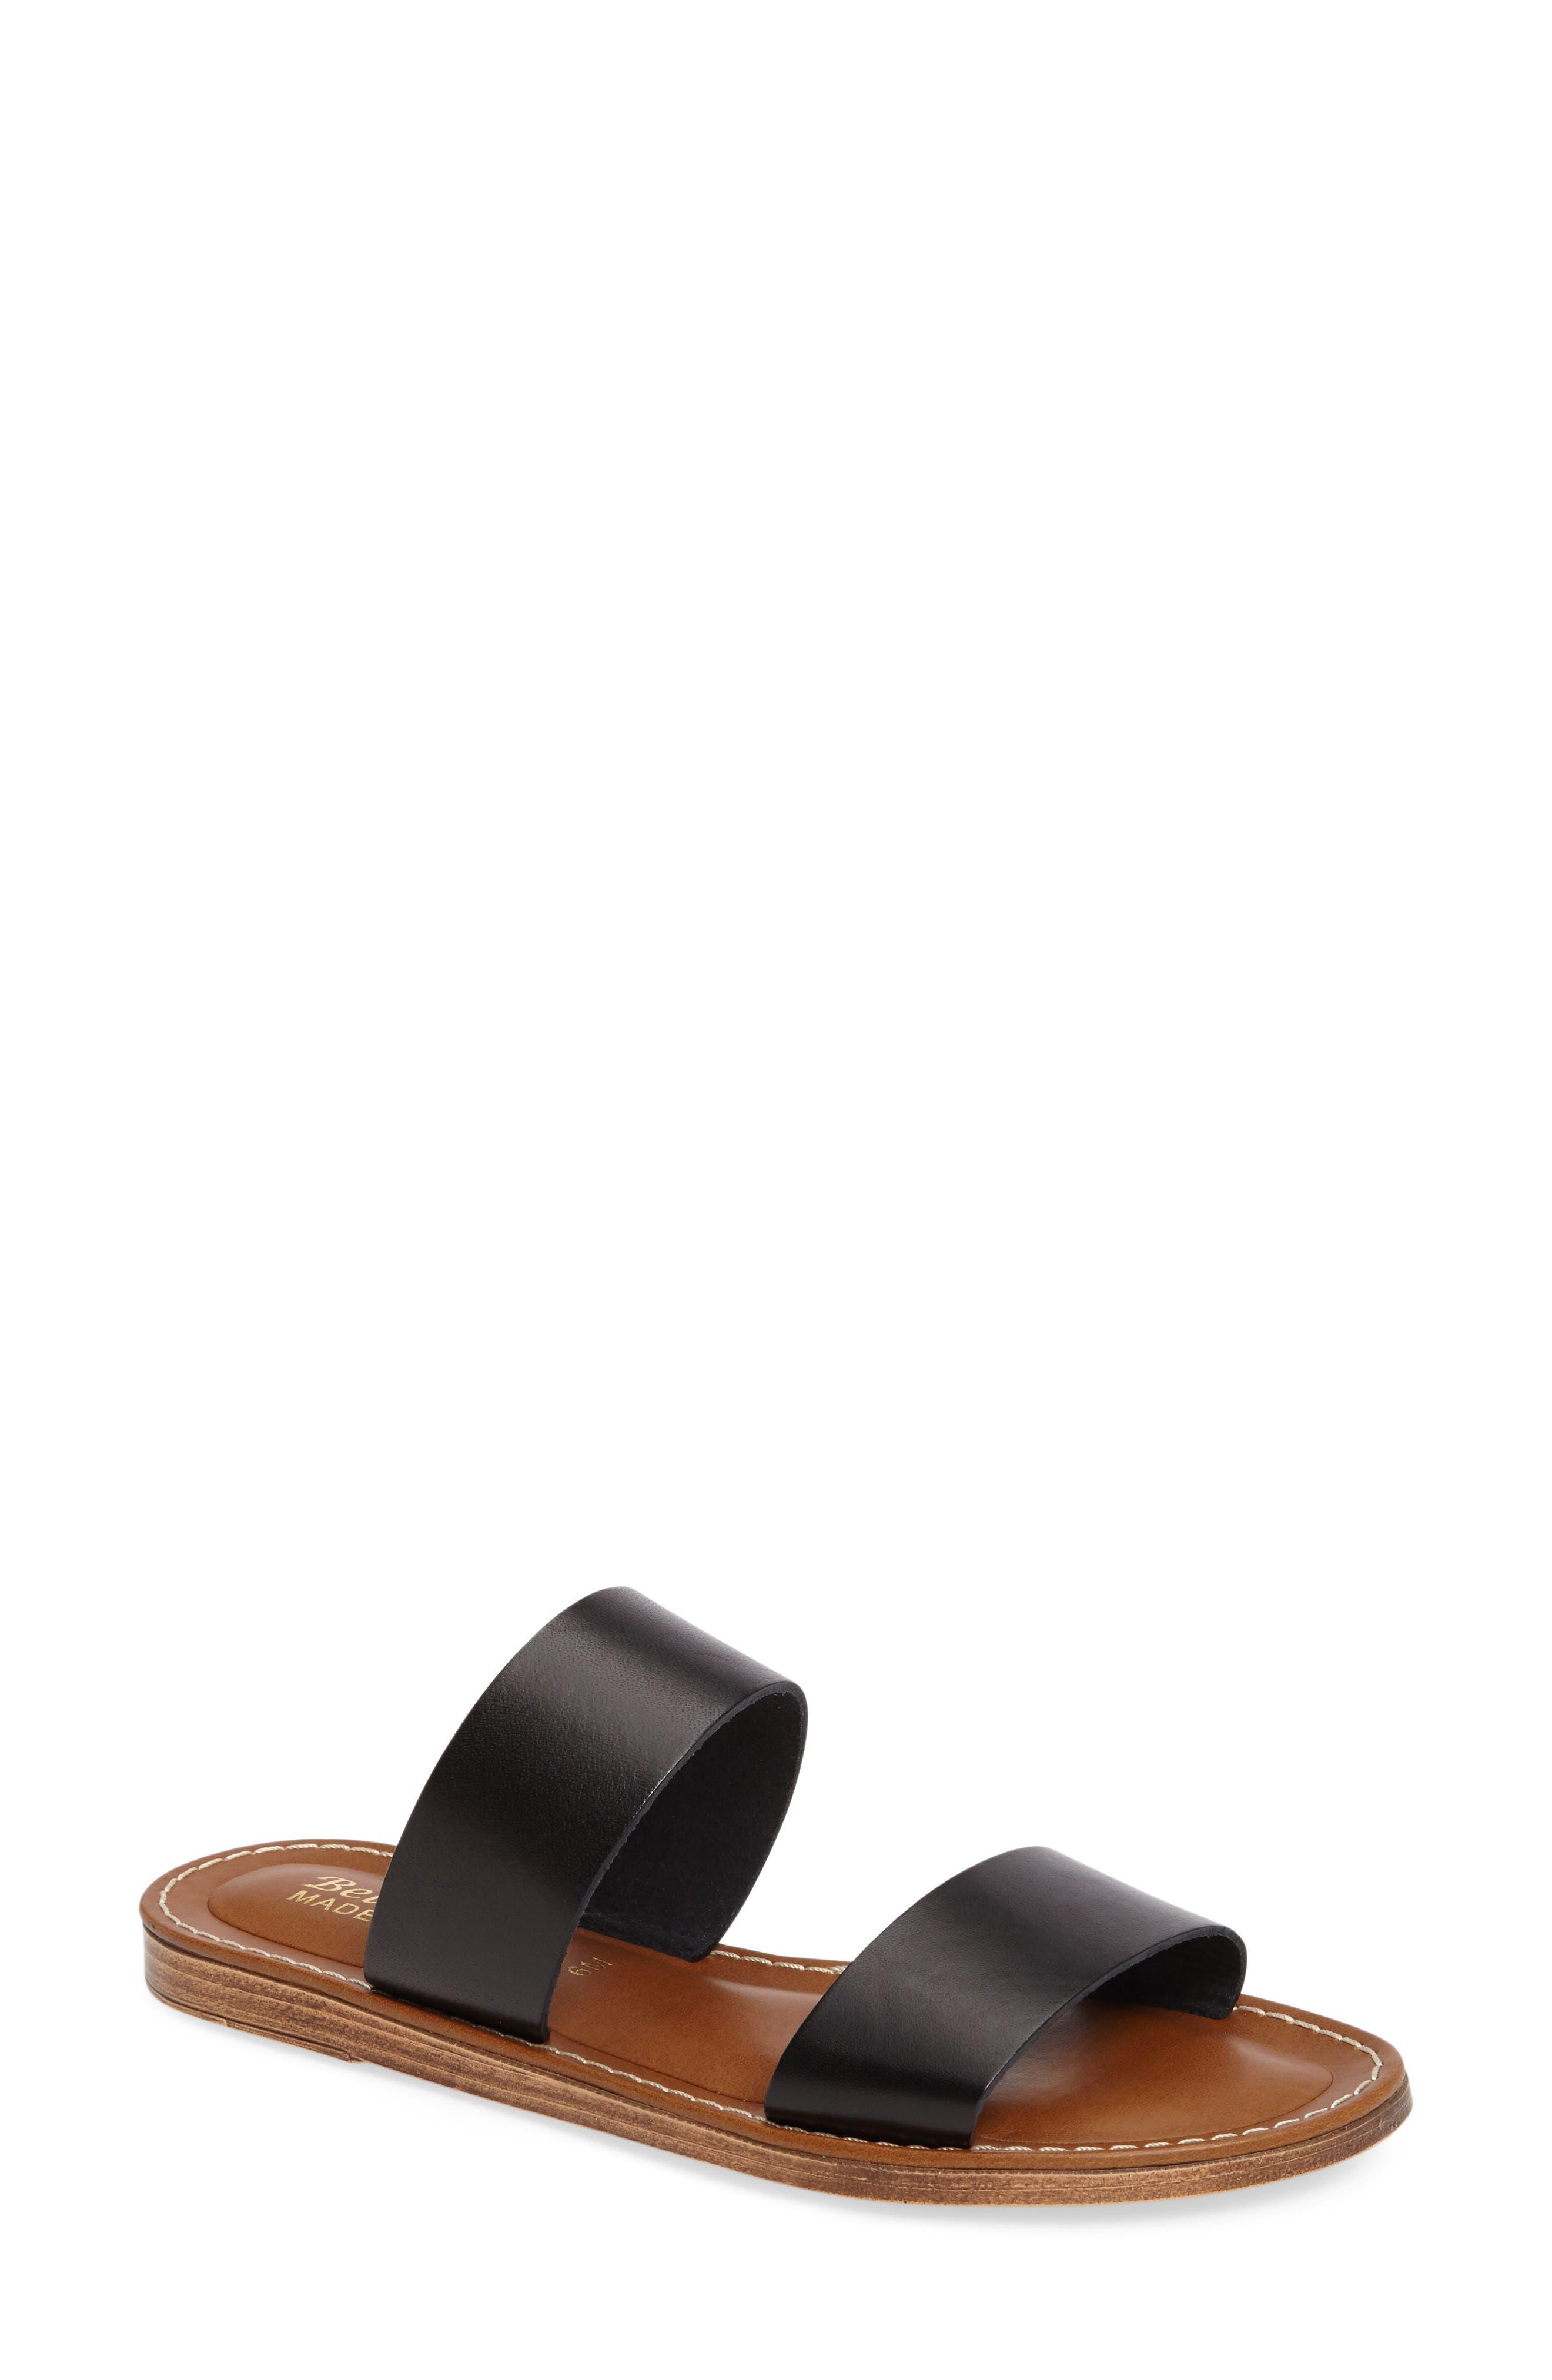 BELLA VITA, Imo Slide Sandal, Main thumbnail 1, color, BLACK LEATHER